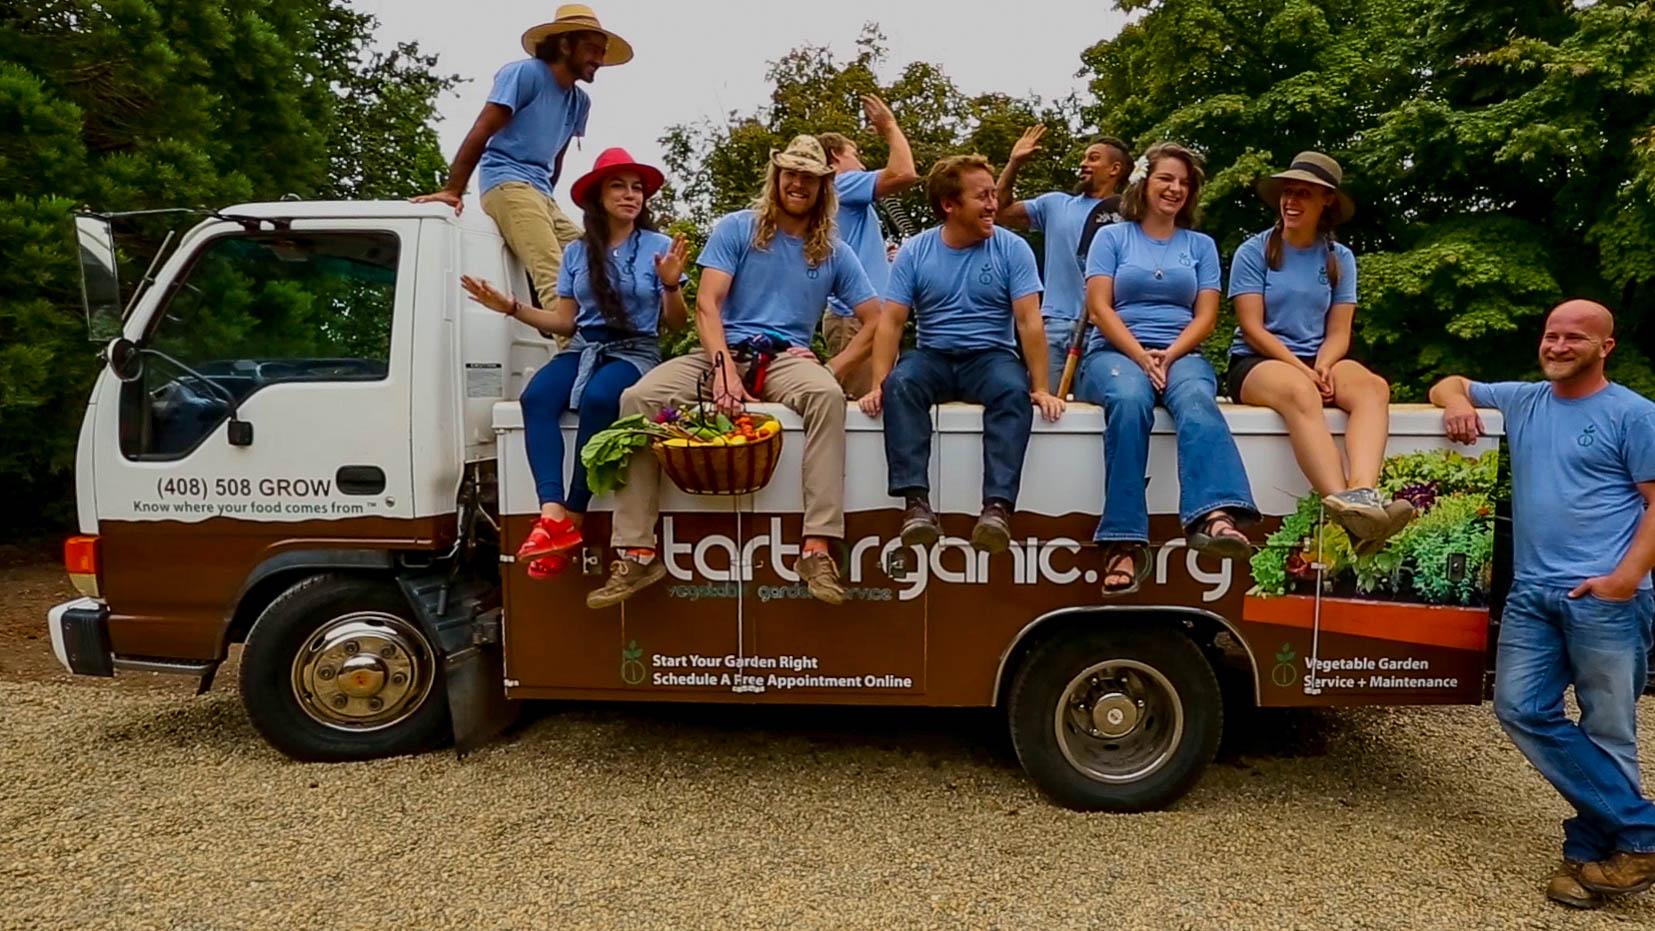 StartOrganic Vegetable Garden Education